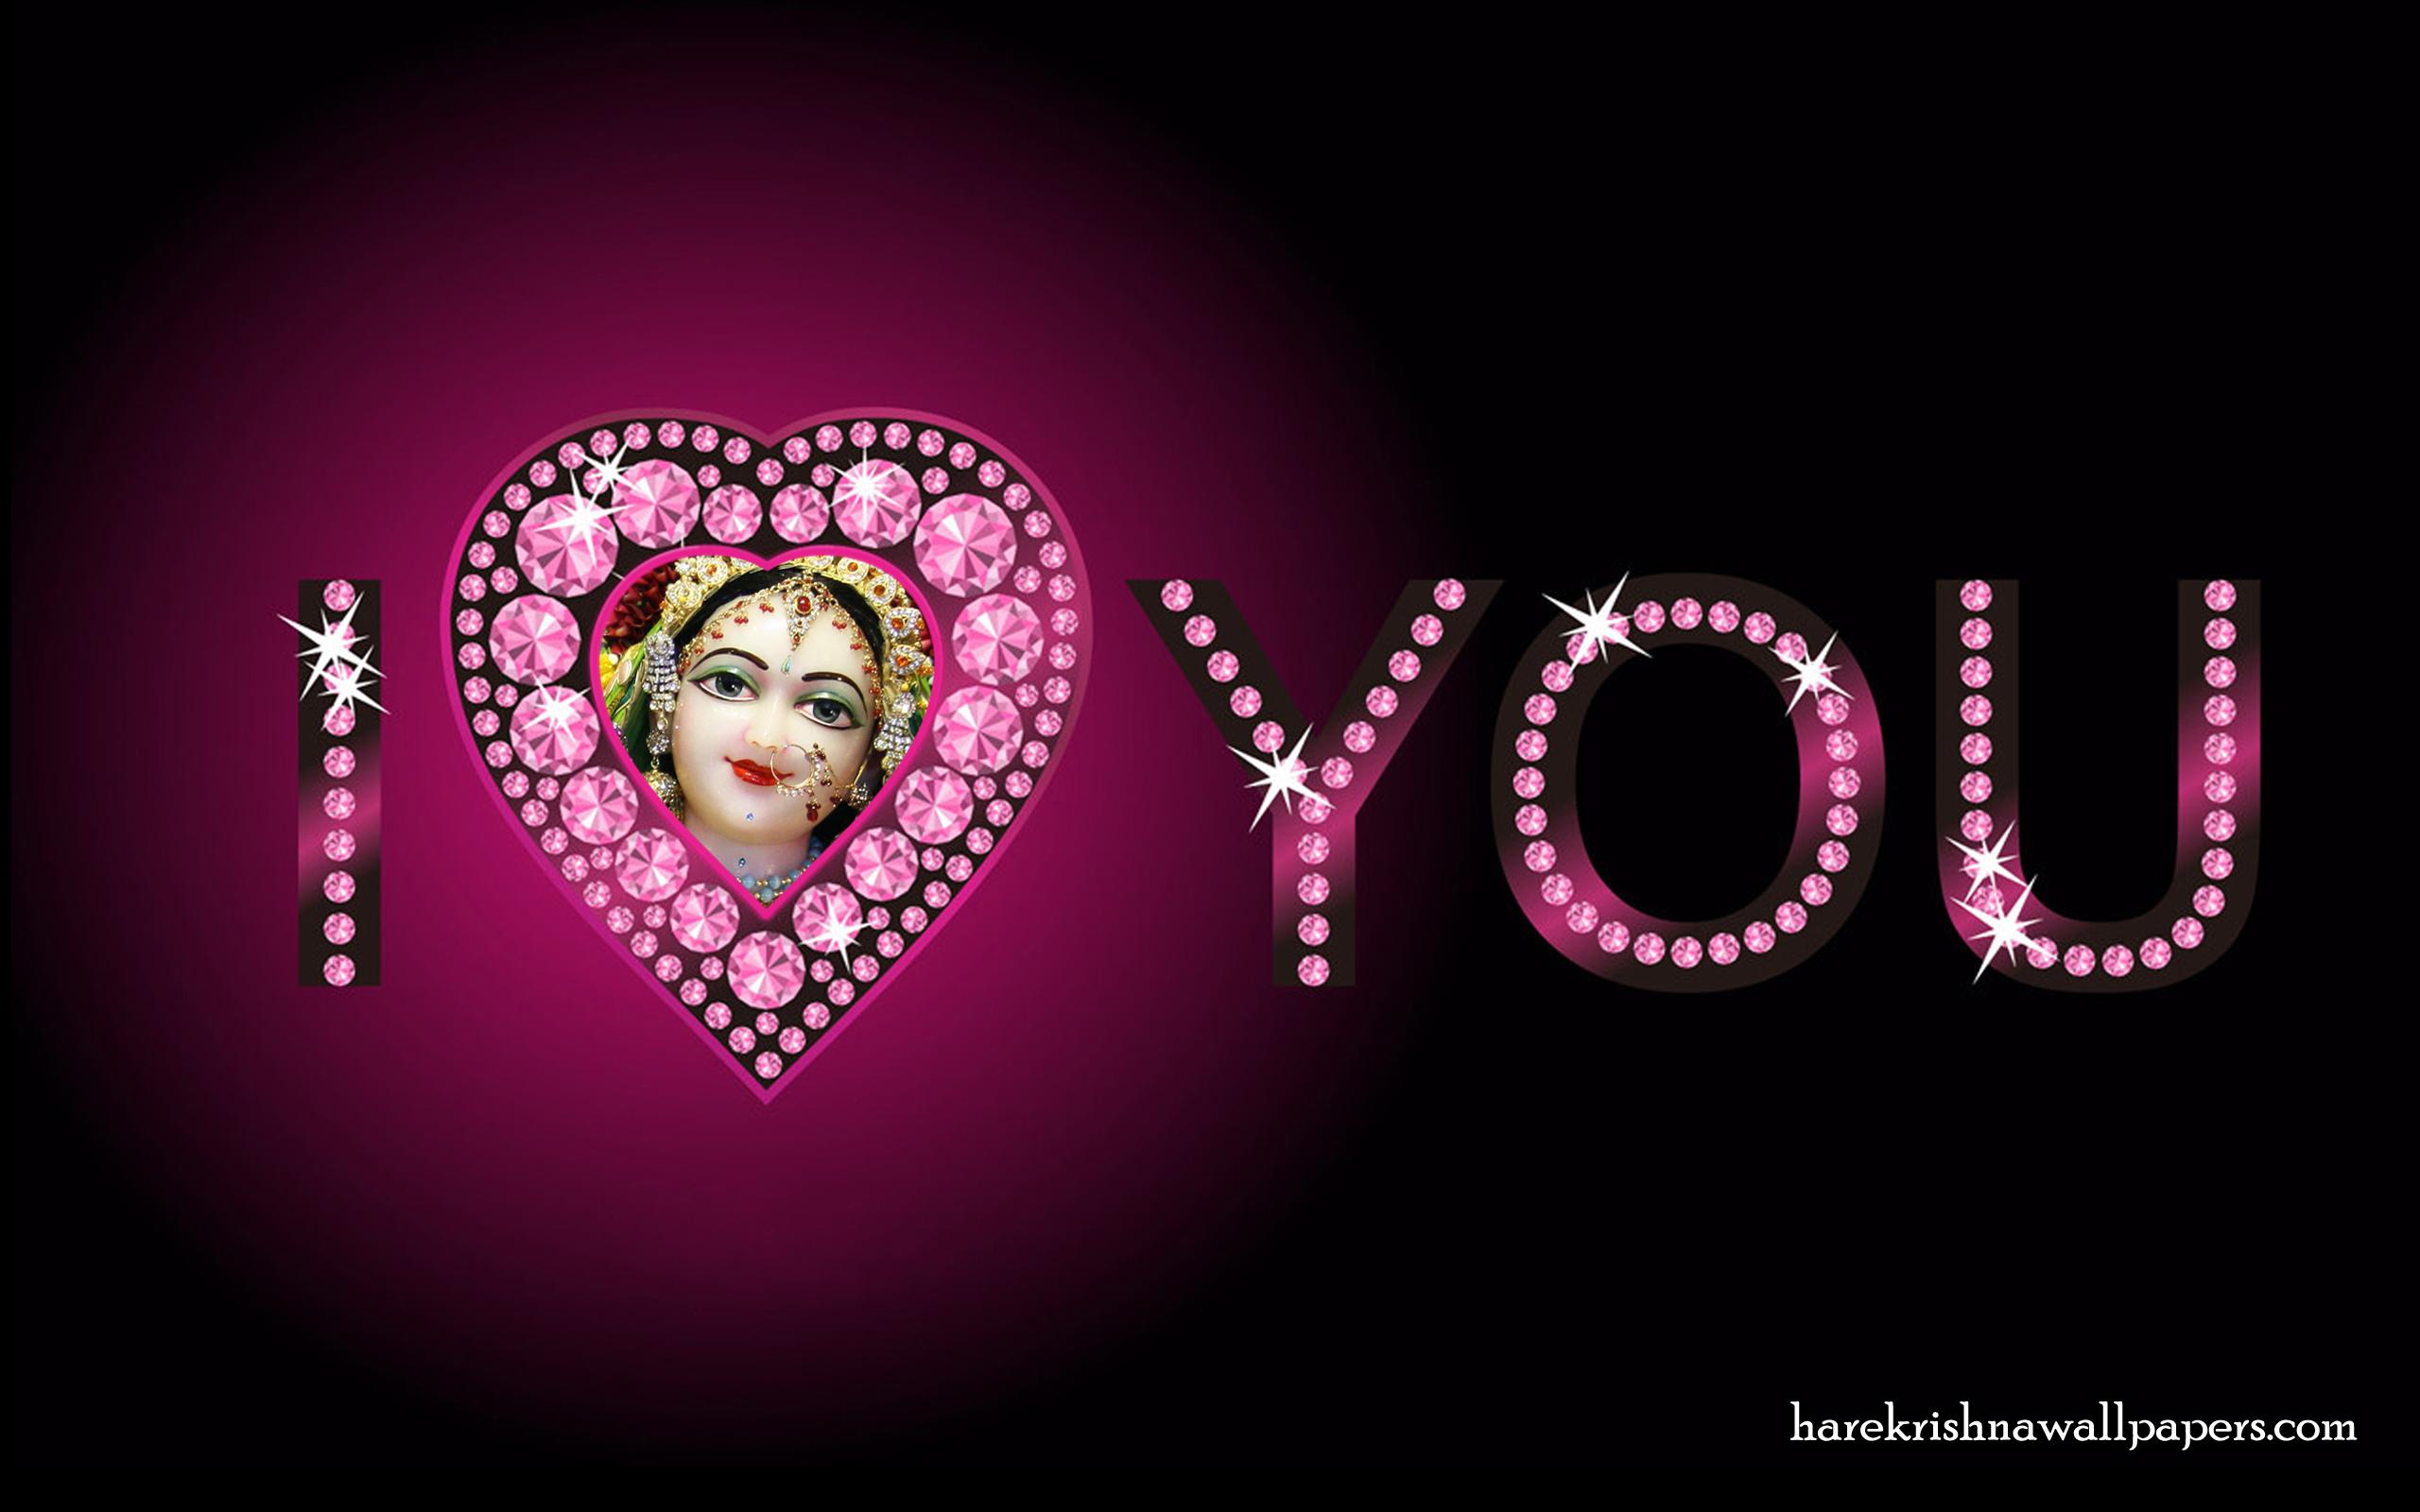 I Love You Radharani Wallpaper (015) Size 2560x1600 Download